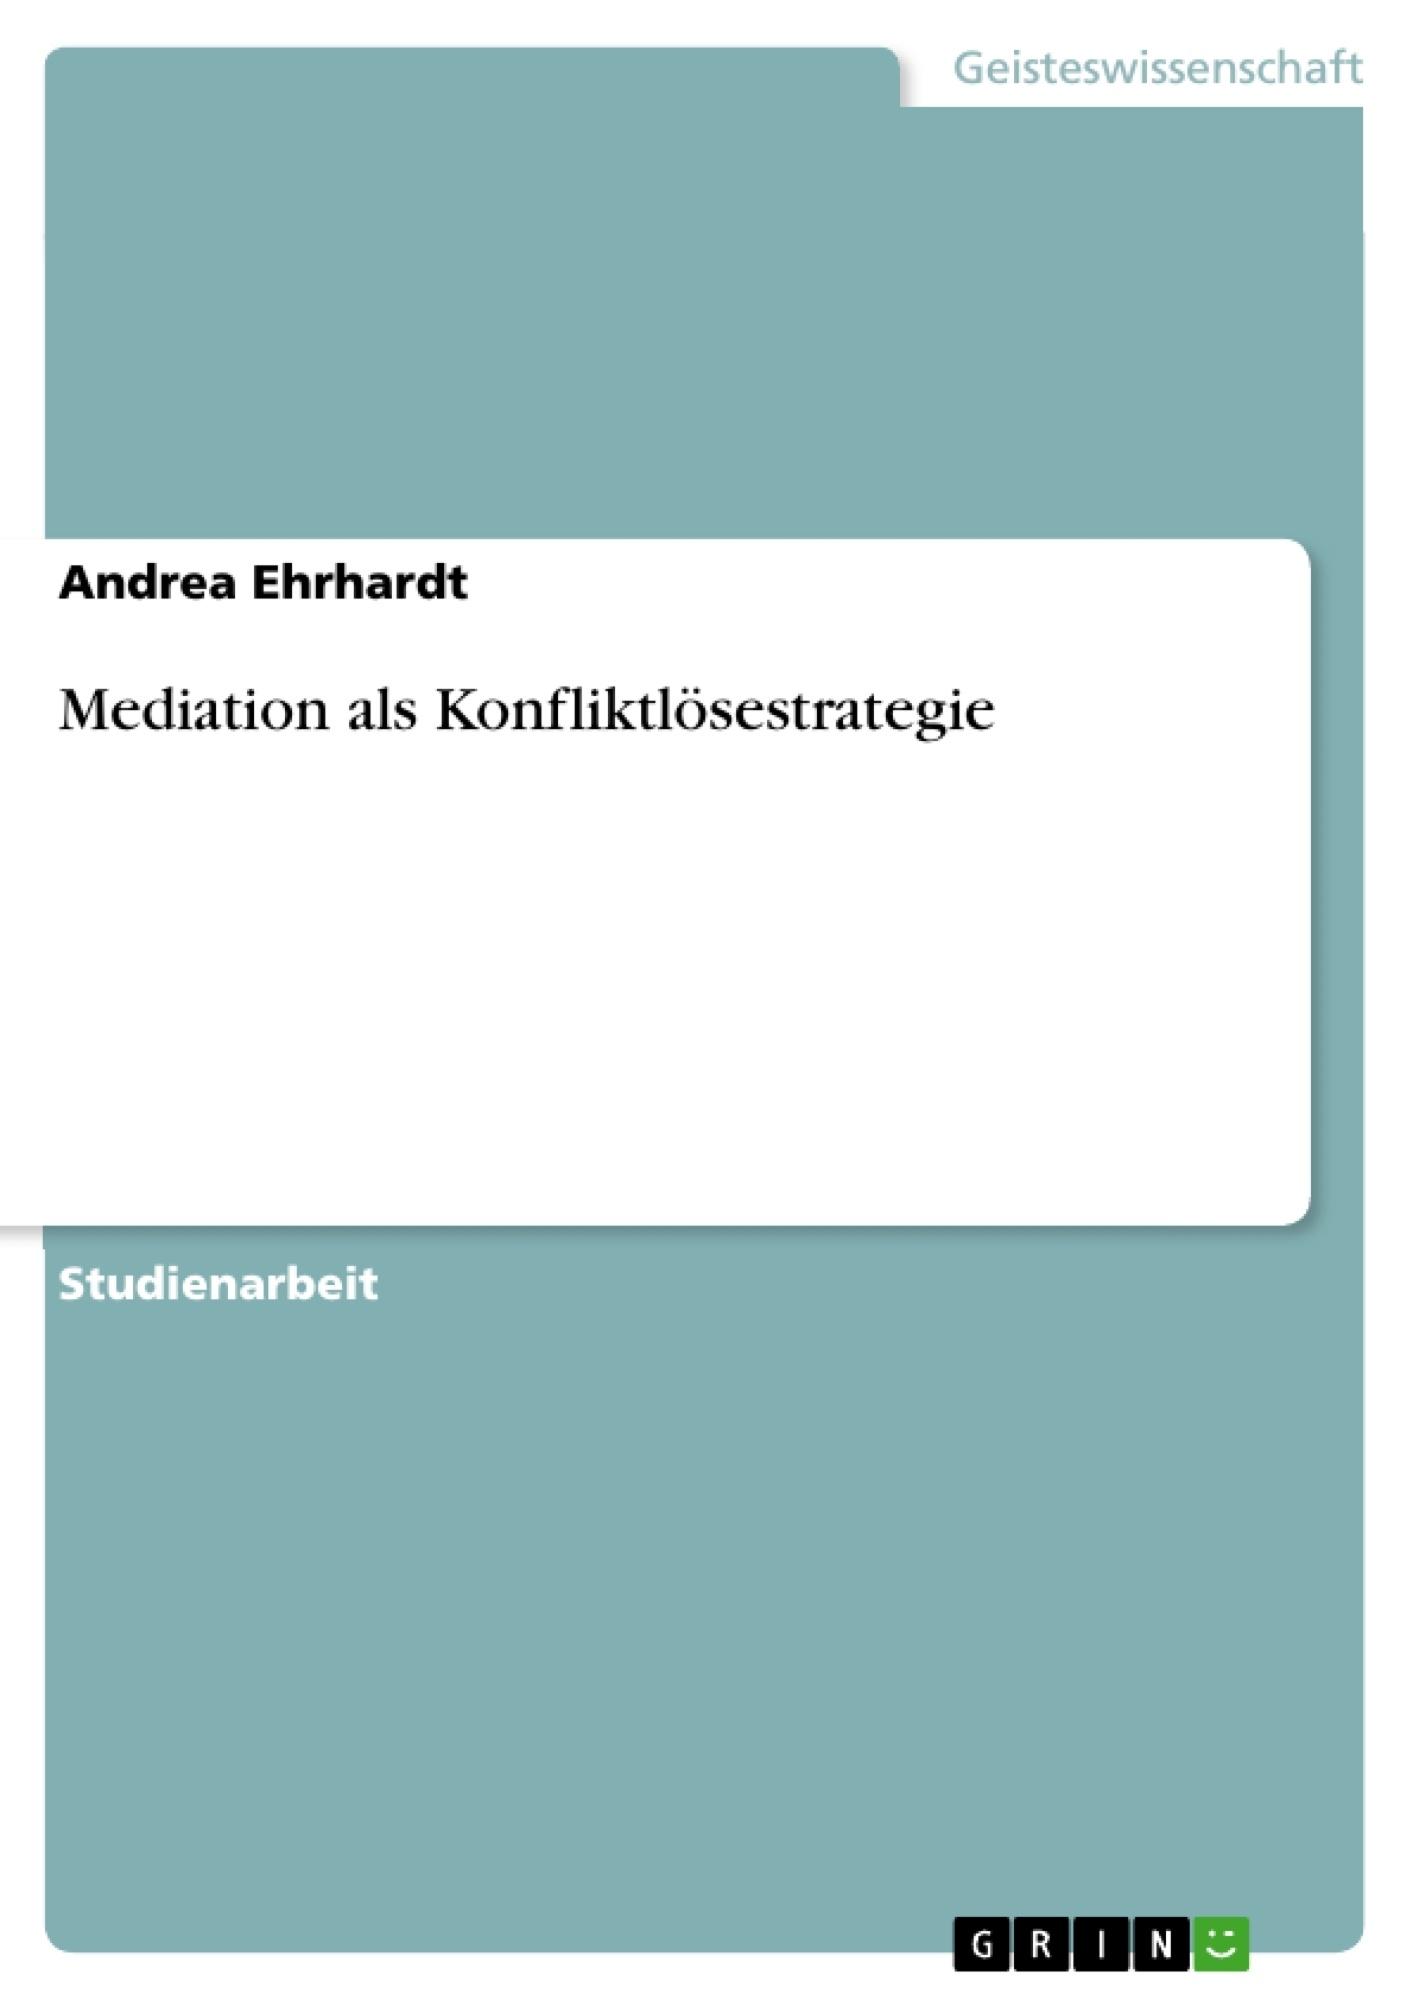 Titel: Mediation als Konfliktlösestrategie